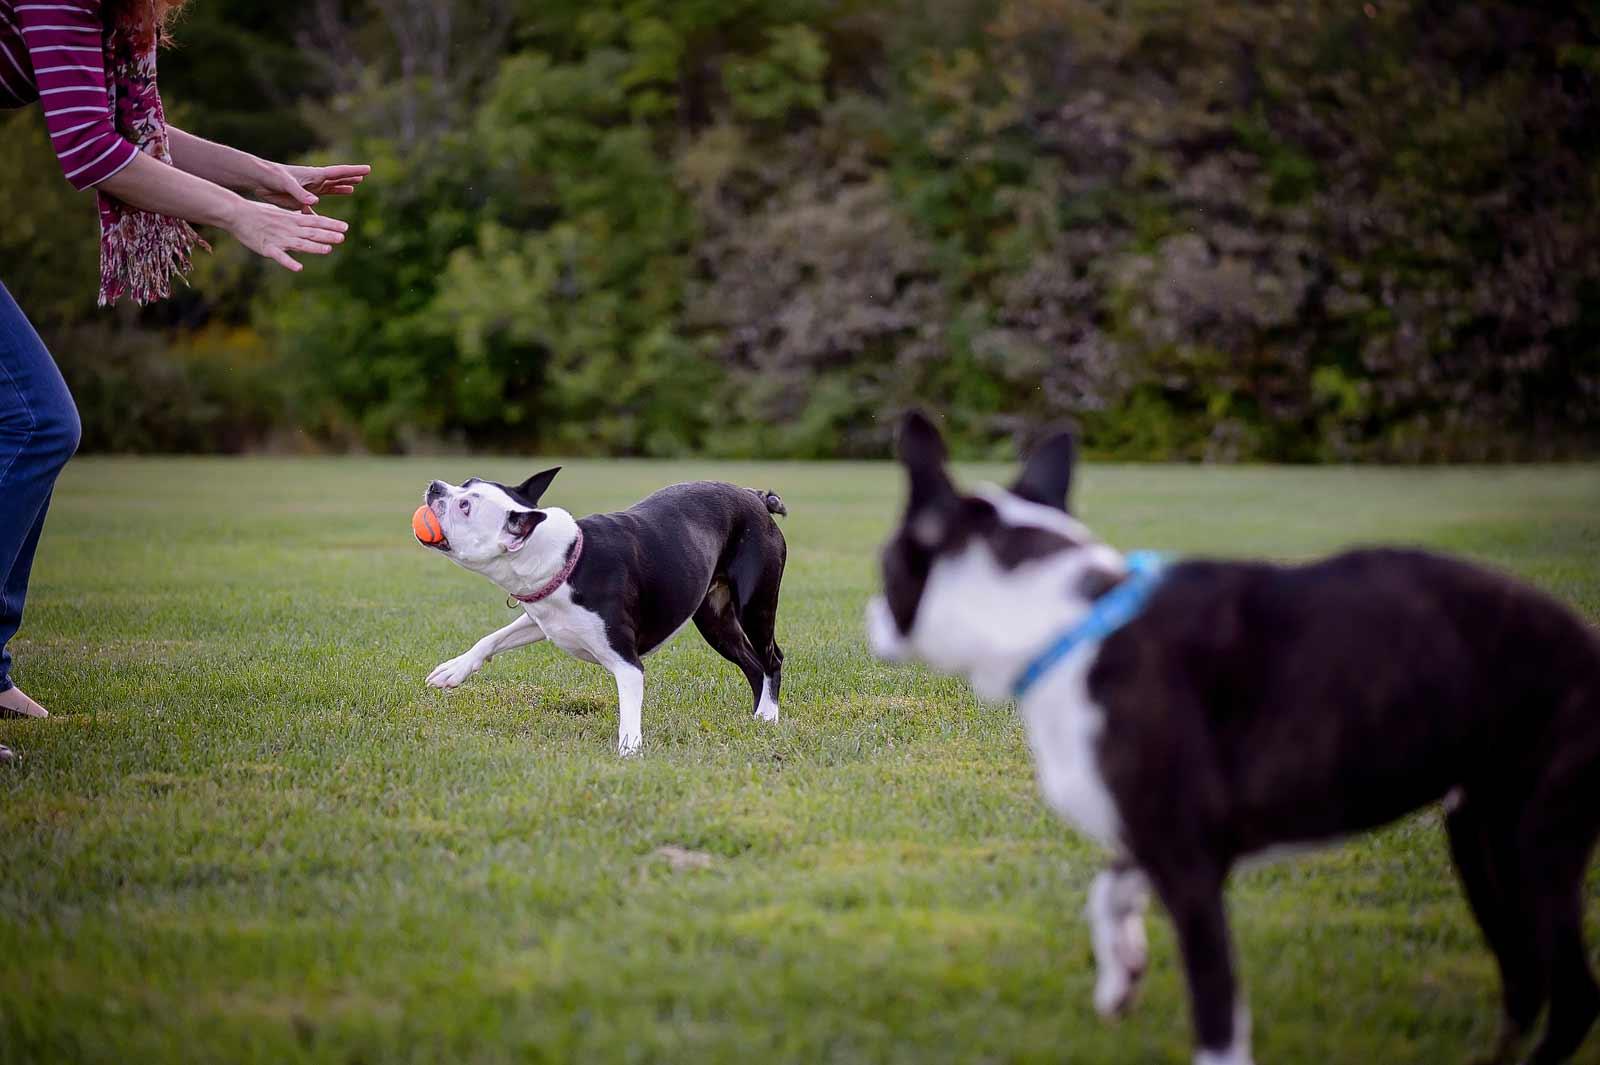 Henry-Chloe-boston-terriers-sneakpeek-10